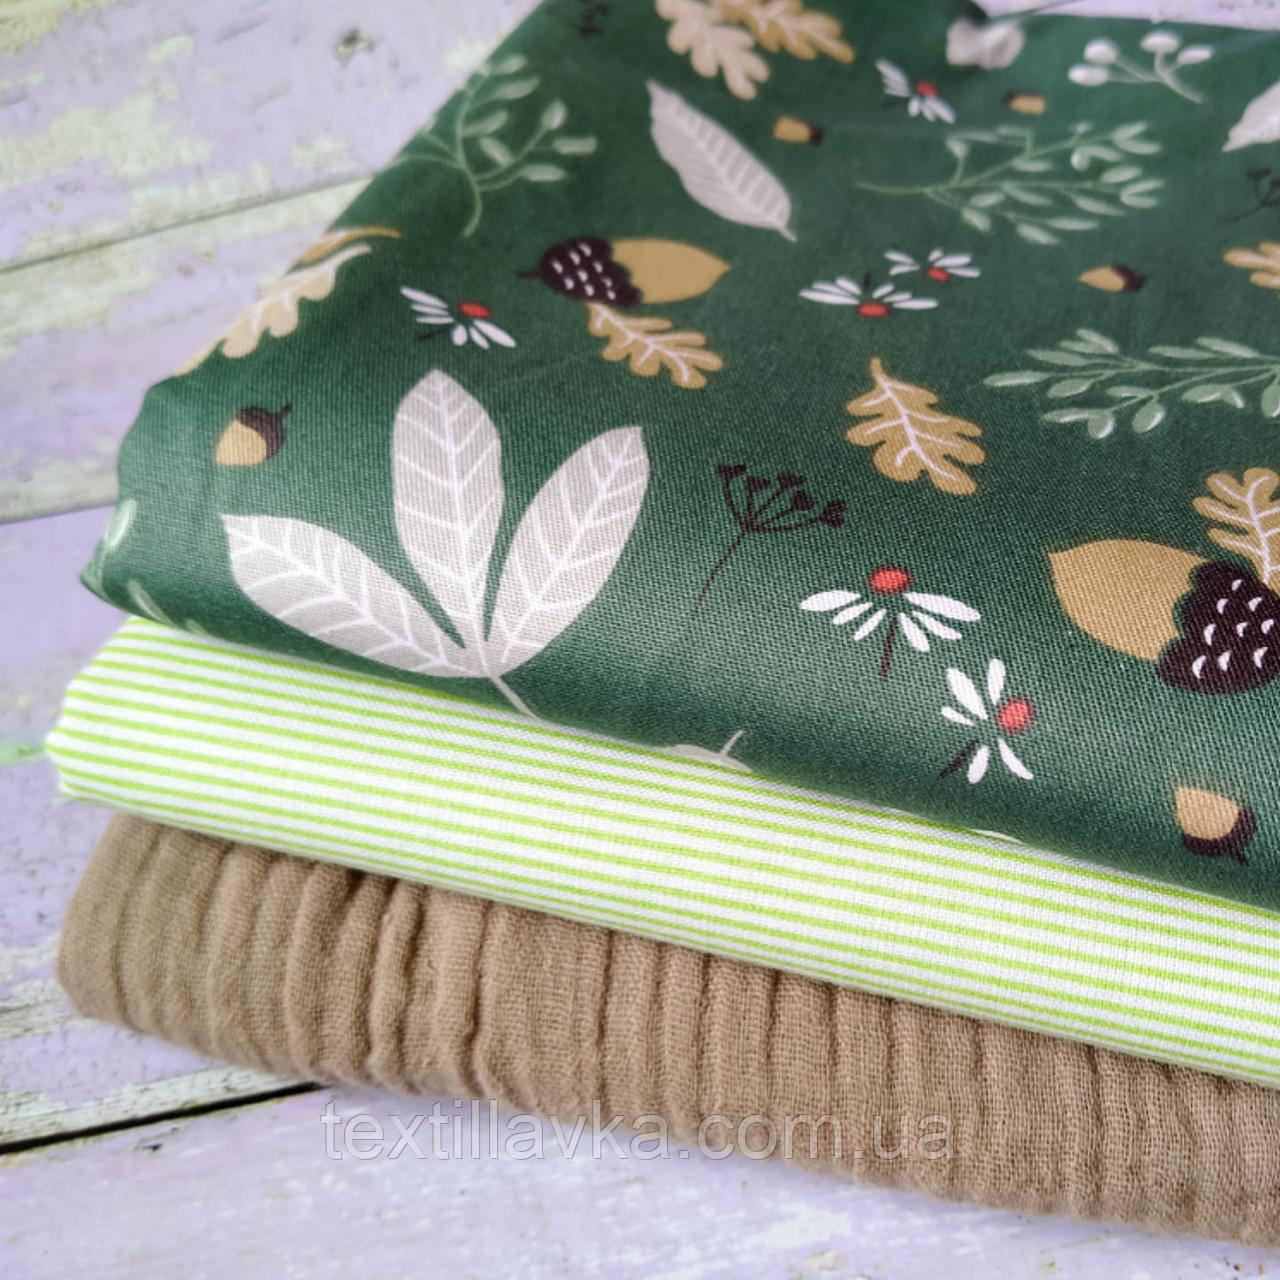 Набор ткани для рукоделия Микс 3шт.